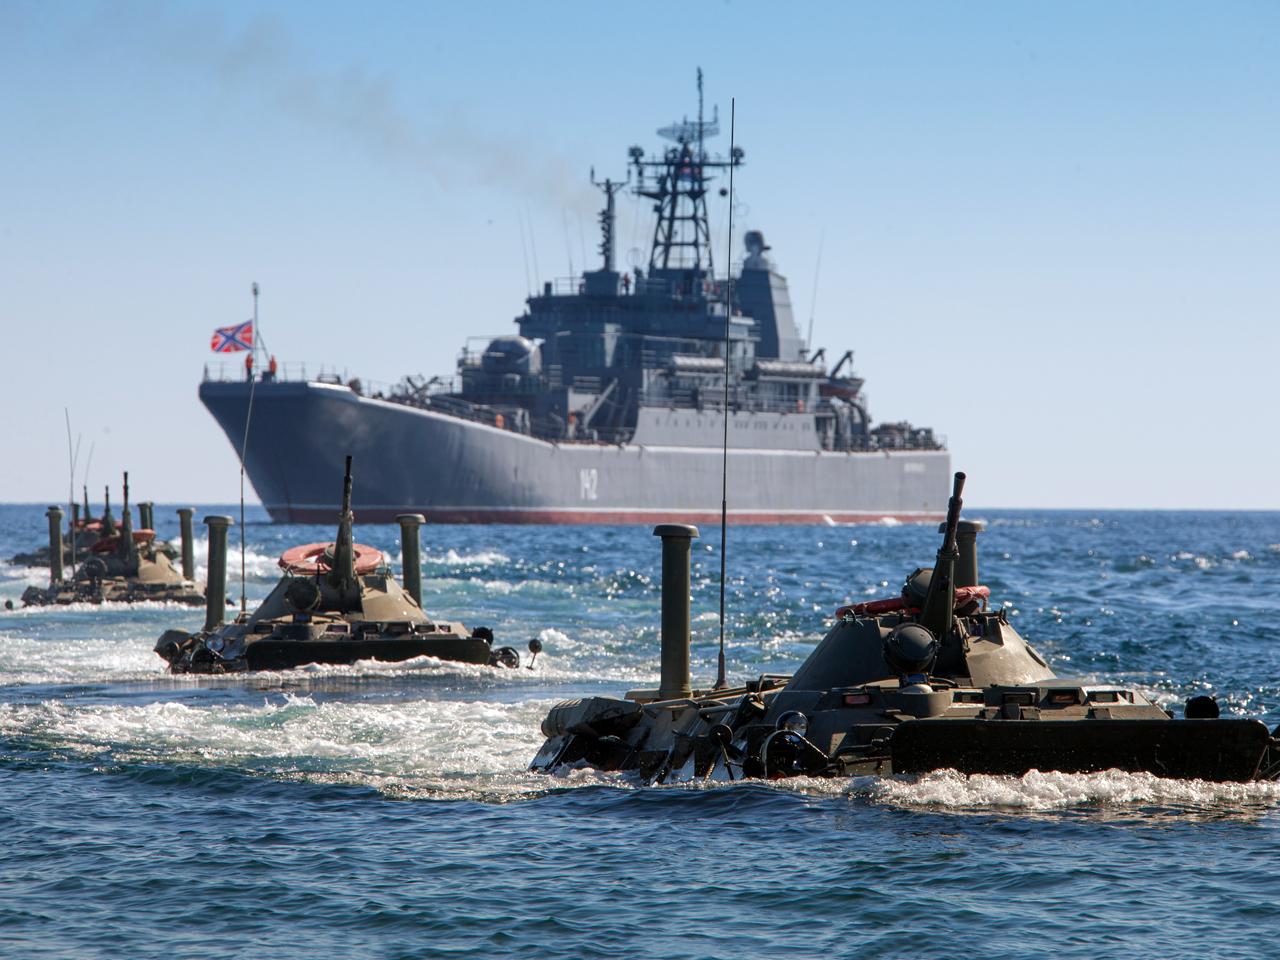 Картинки морского флота для детей